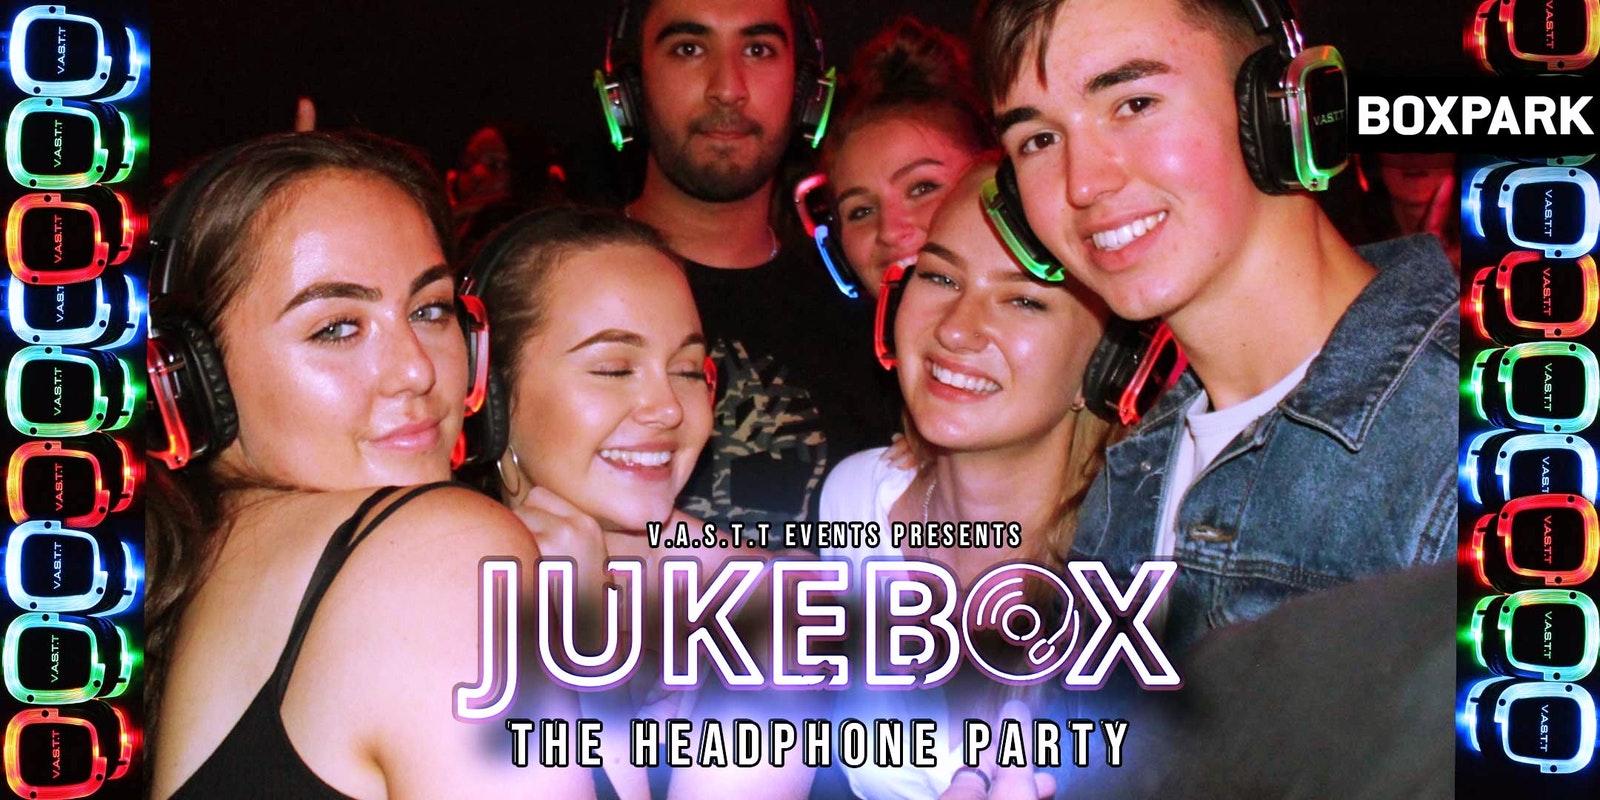 Jukebox- The Headphone Party @Boxpark Shoreditch